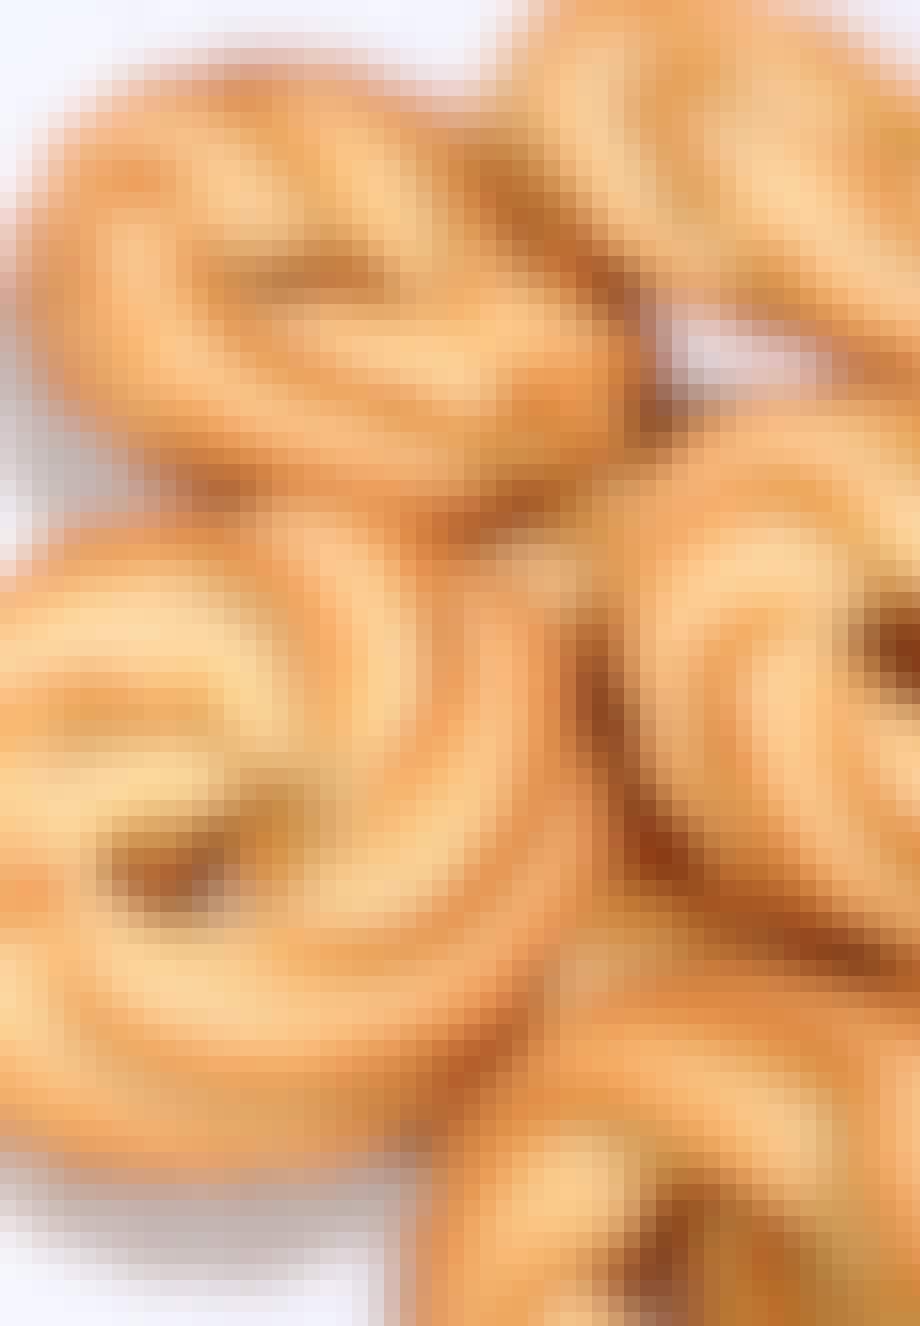 Gyldne vaniljekranse